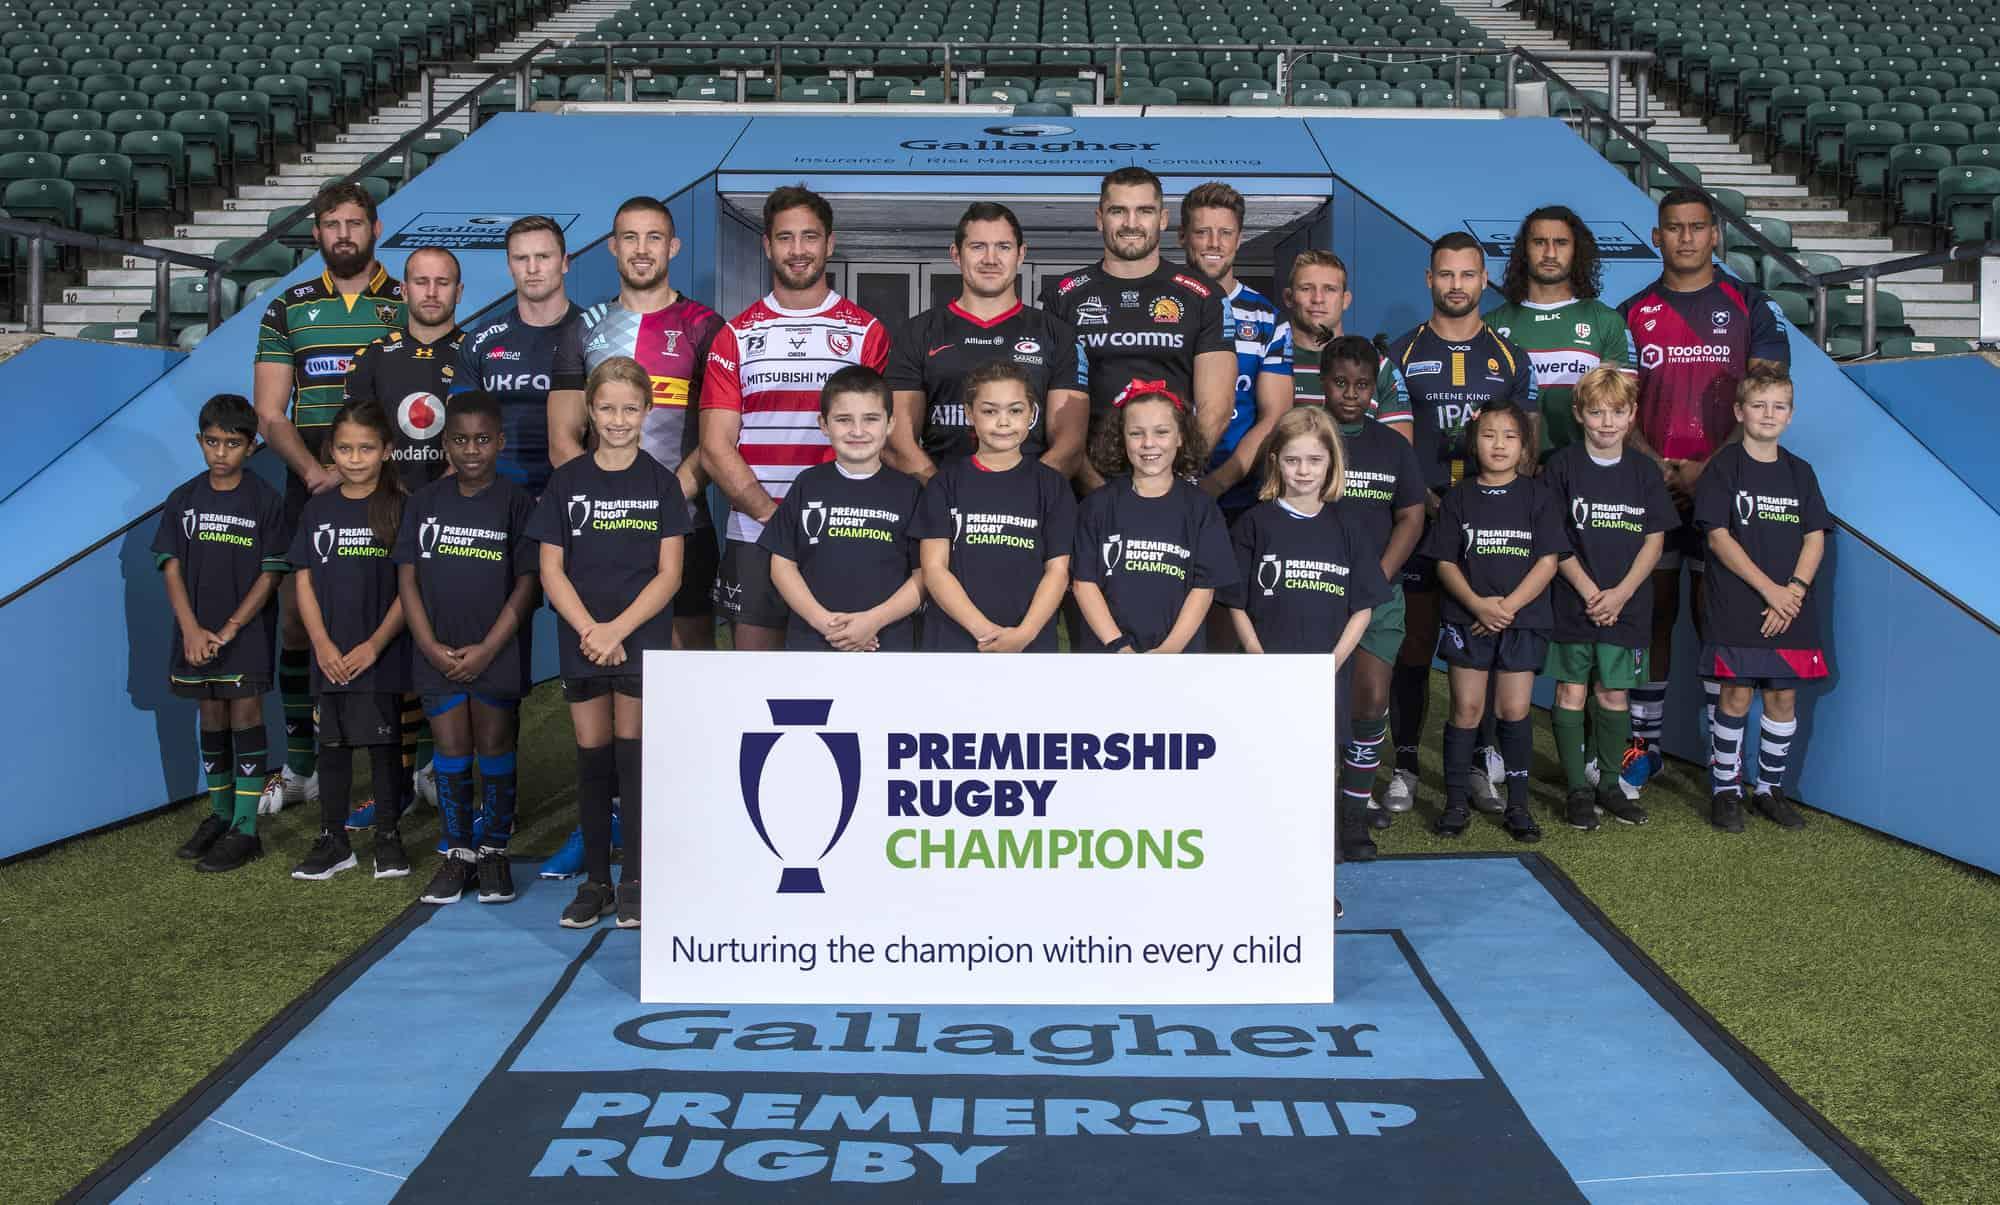 Gallagher Premiership Rugby Launch, Twickenham, UK - 11 Sept 2019